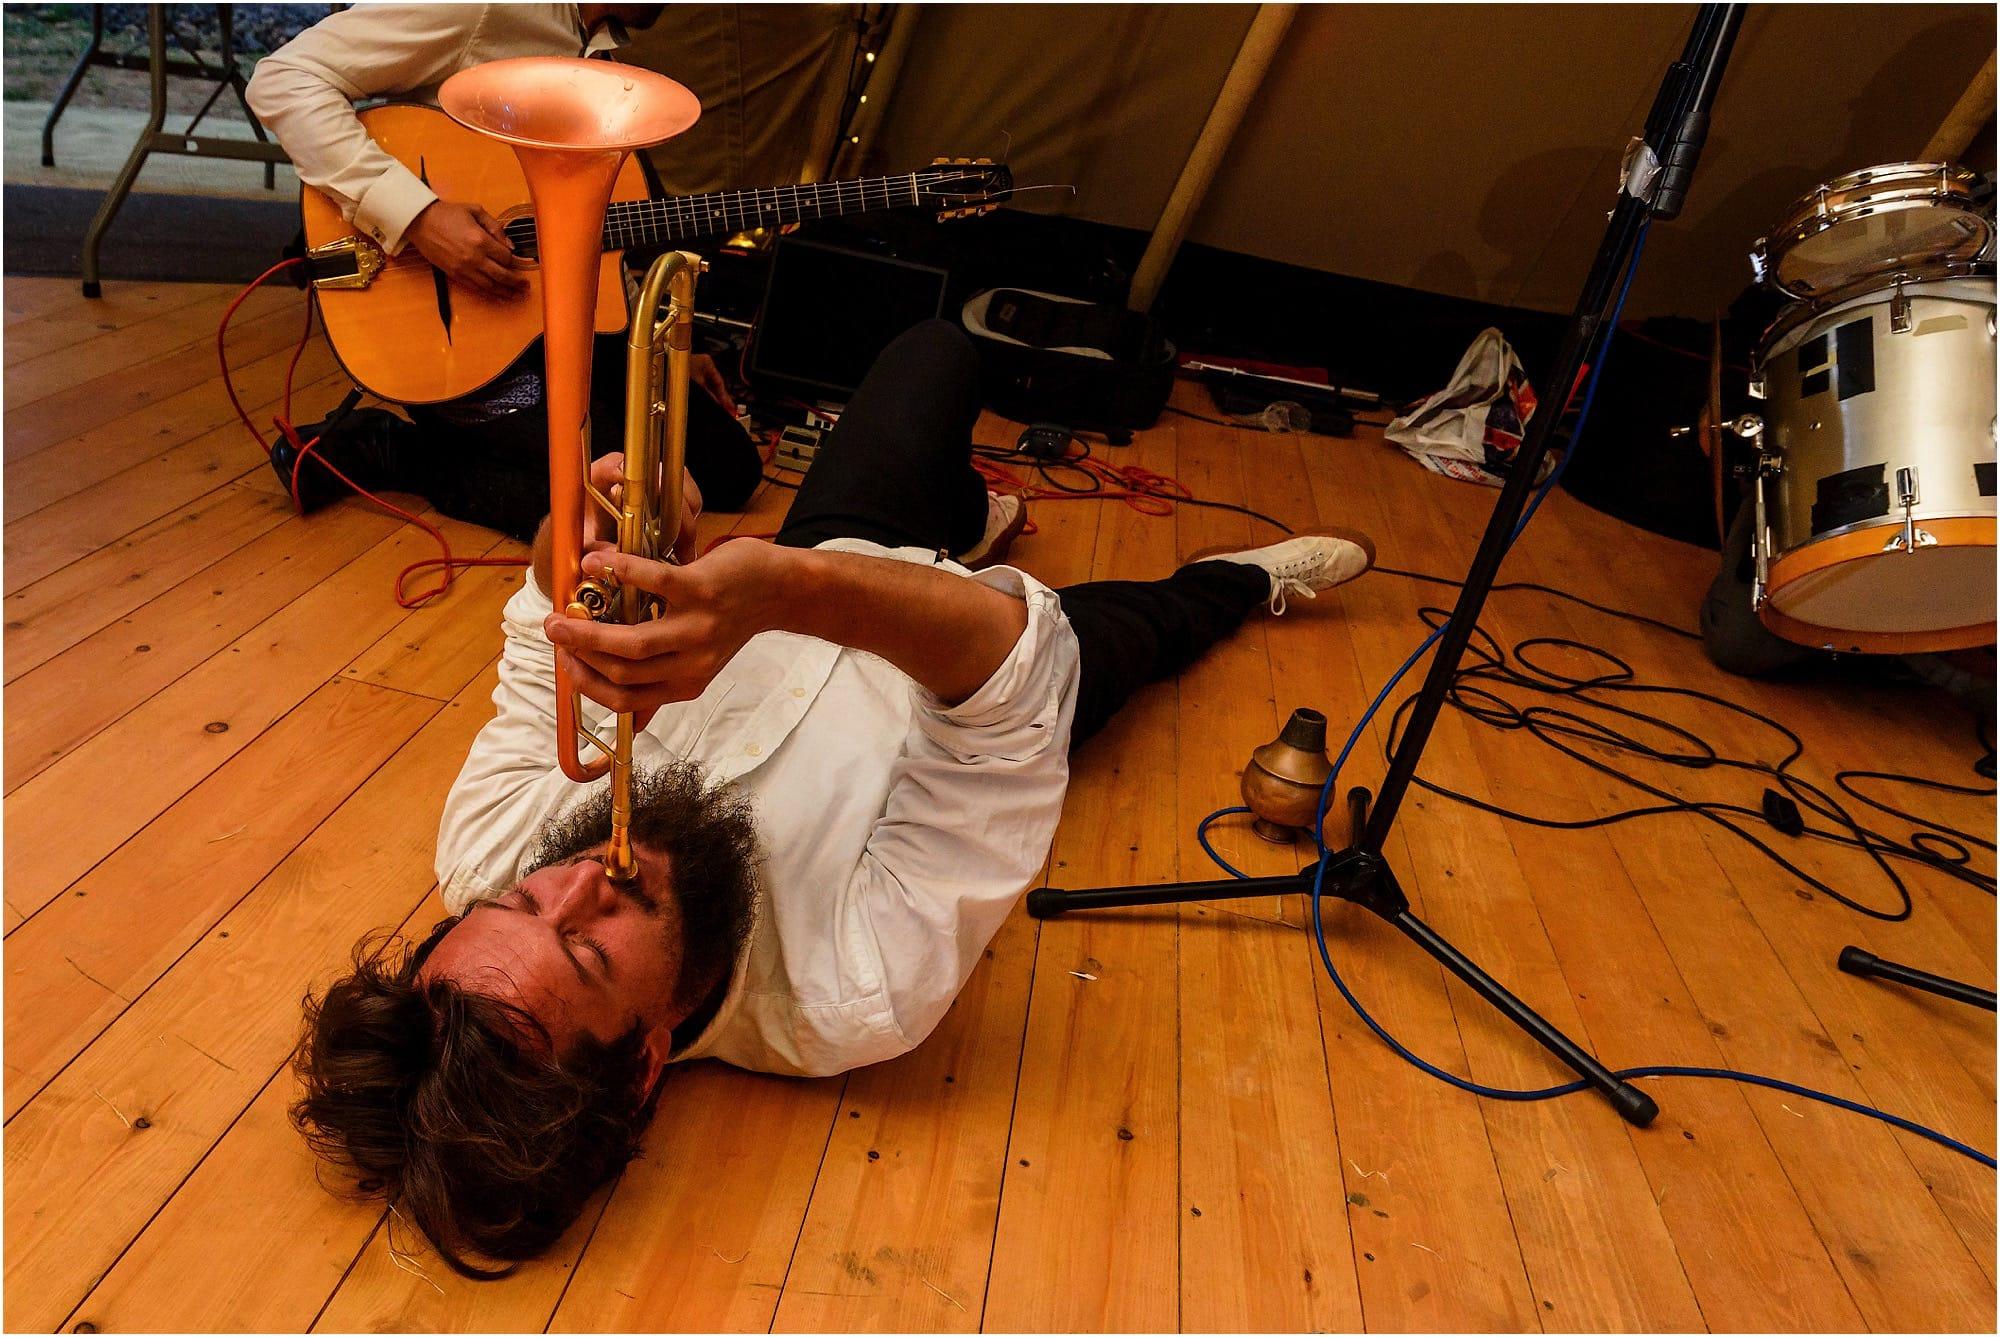 trumpeter on the floor